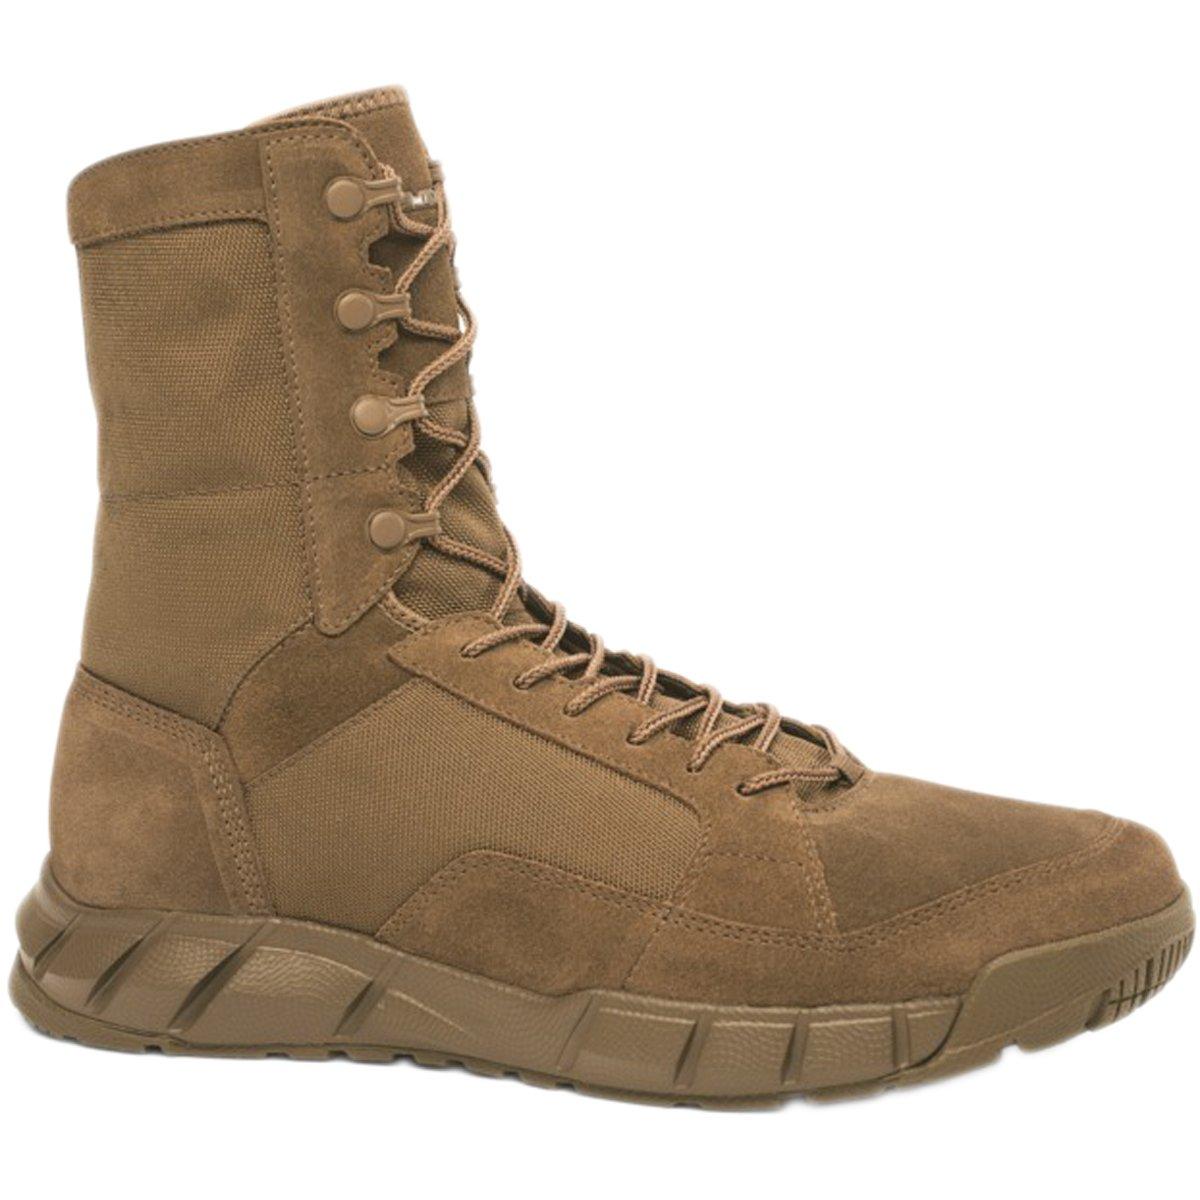 Oakley Men's Light Assault 2 Boots,9.5,Coyote